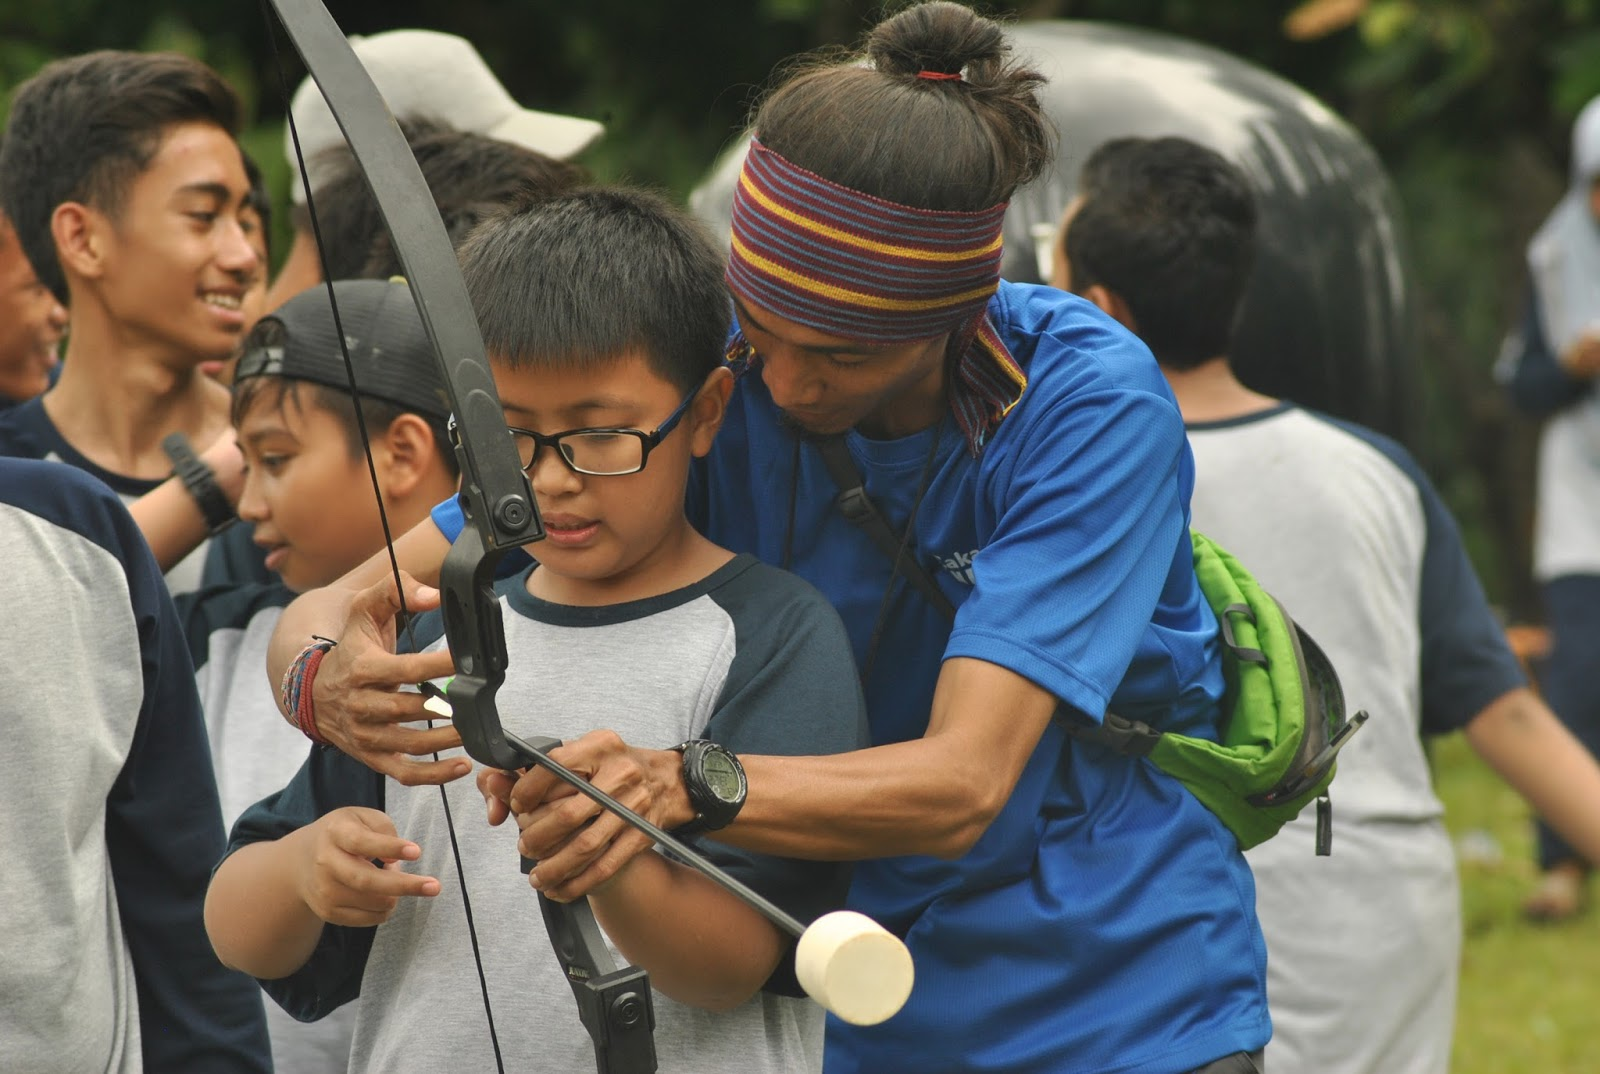 Archery Hambalang